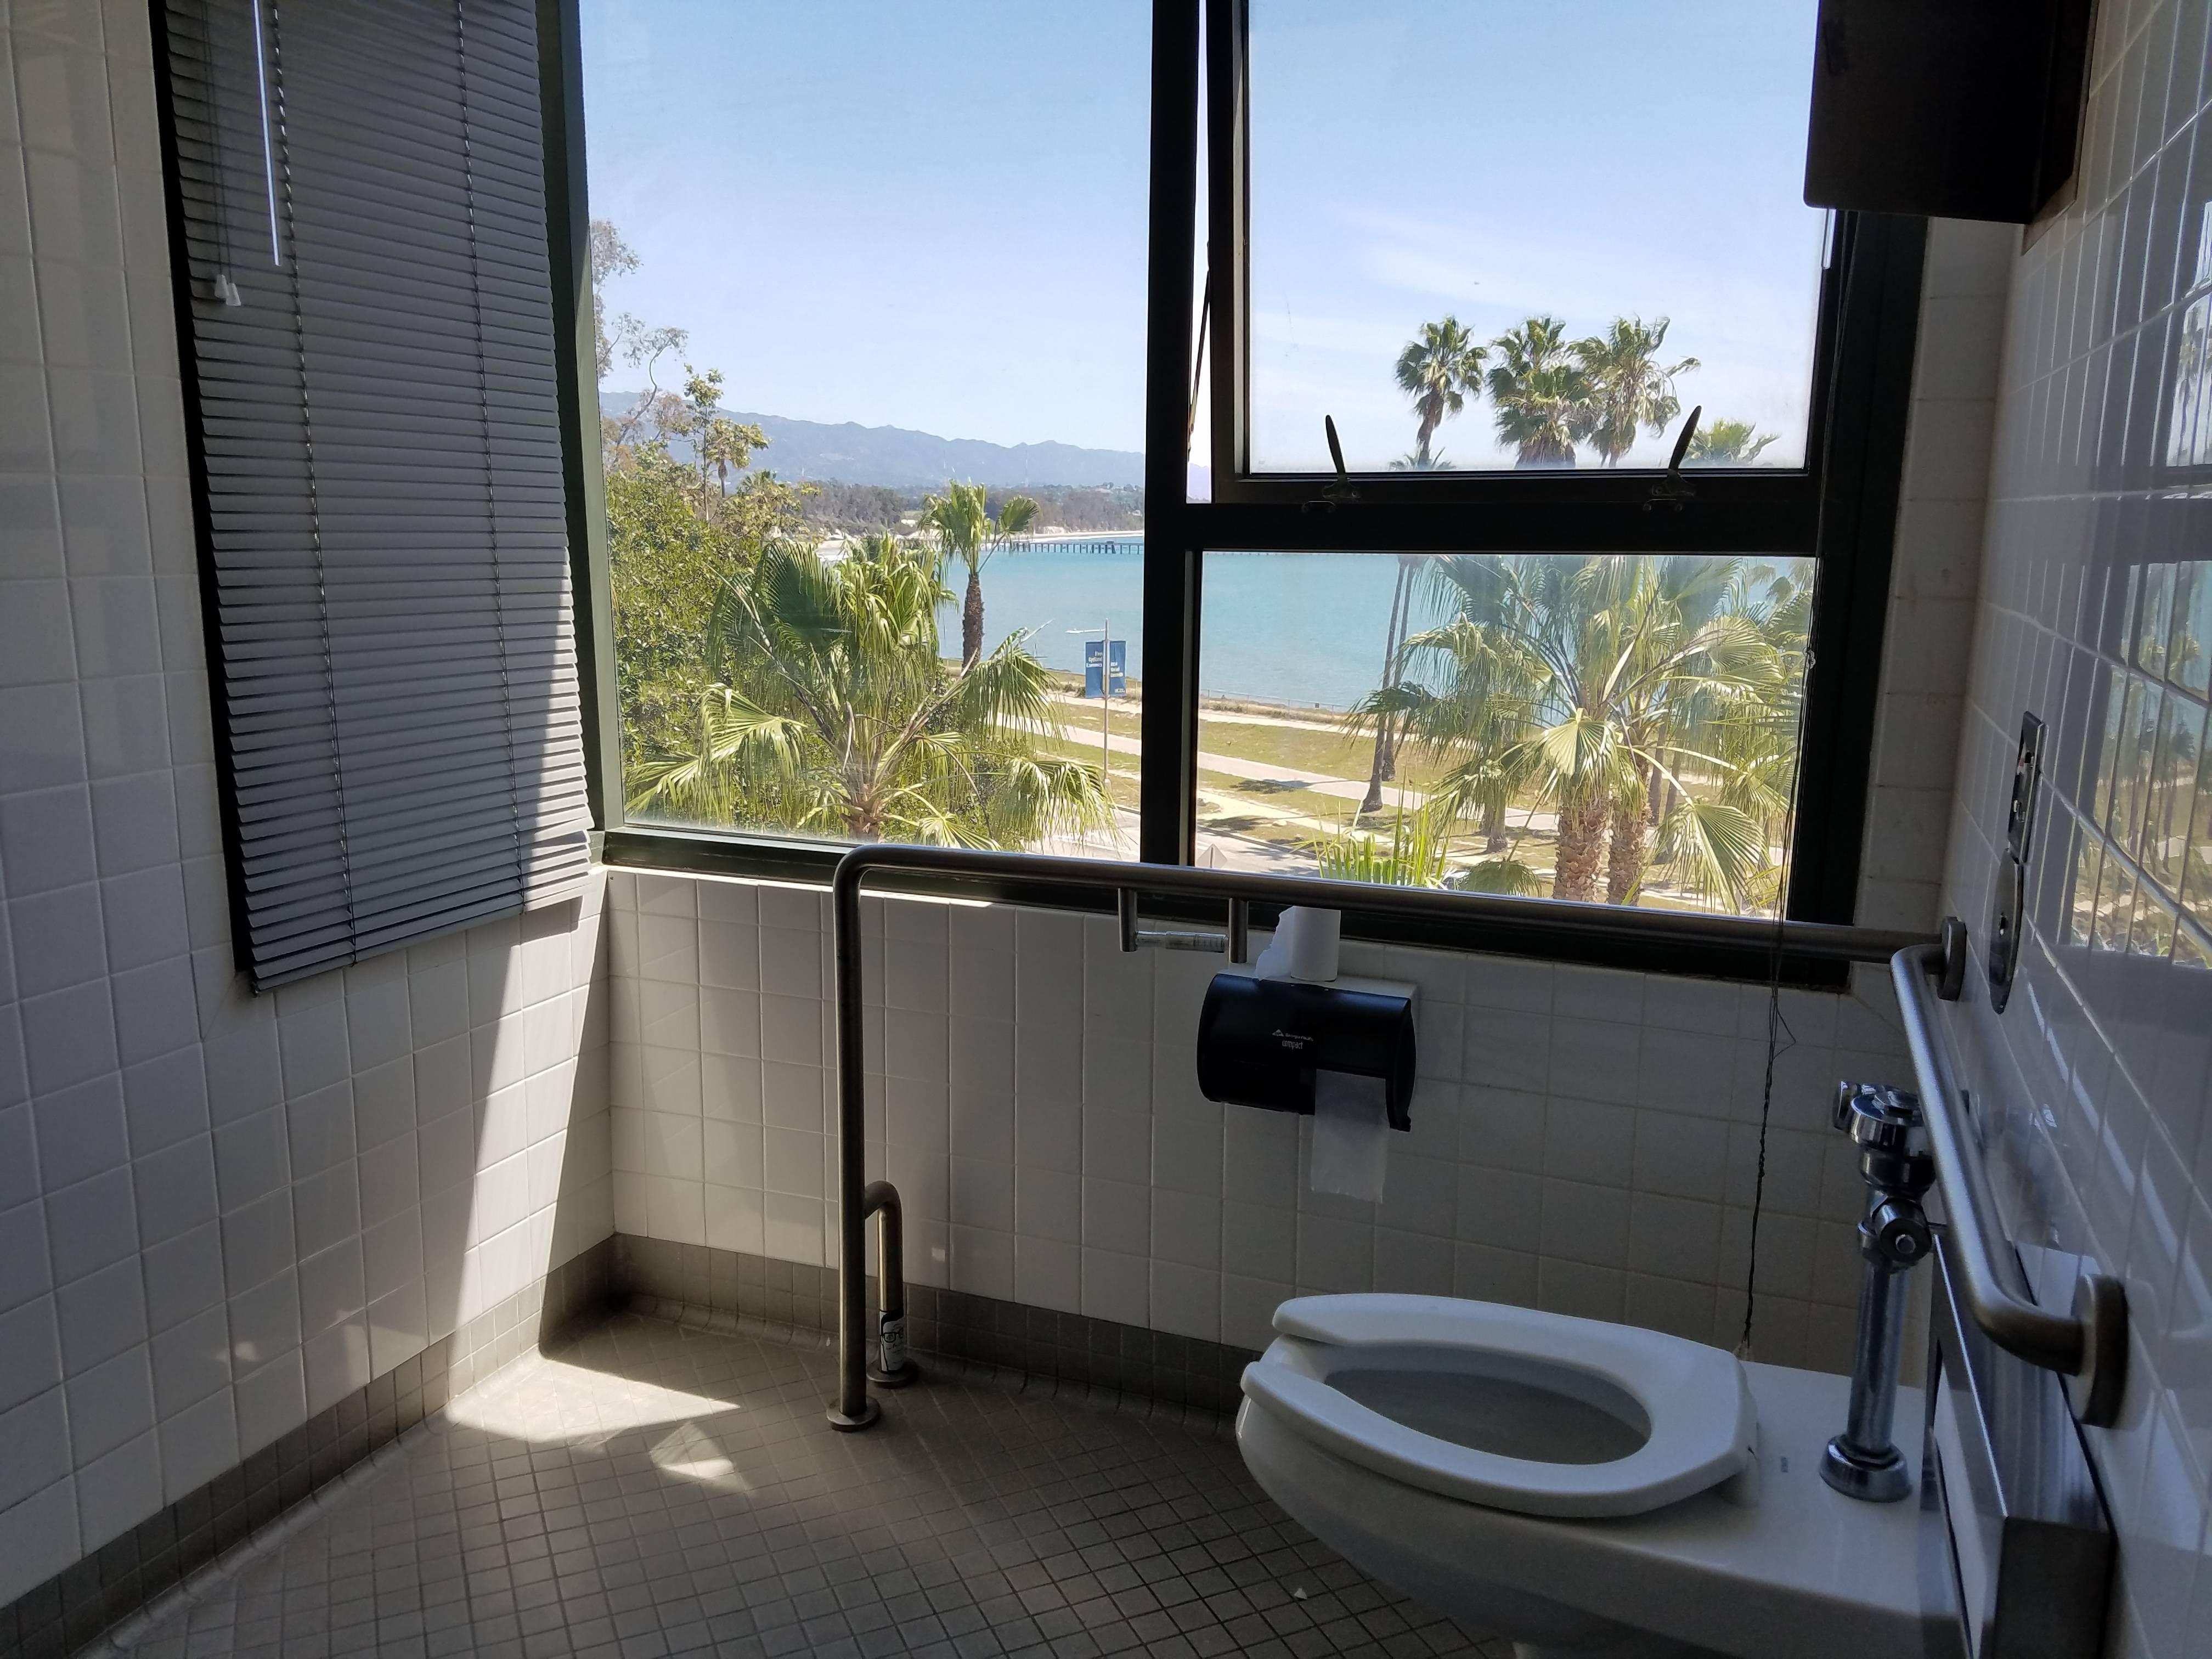 I Found The Reddit Famous Ucsb Bathroom Pics